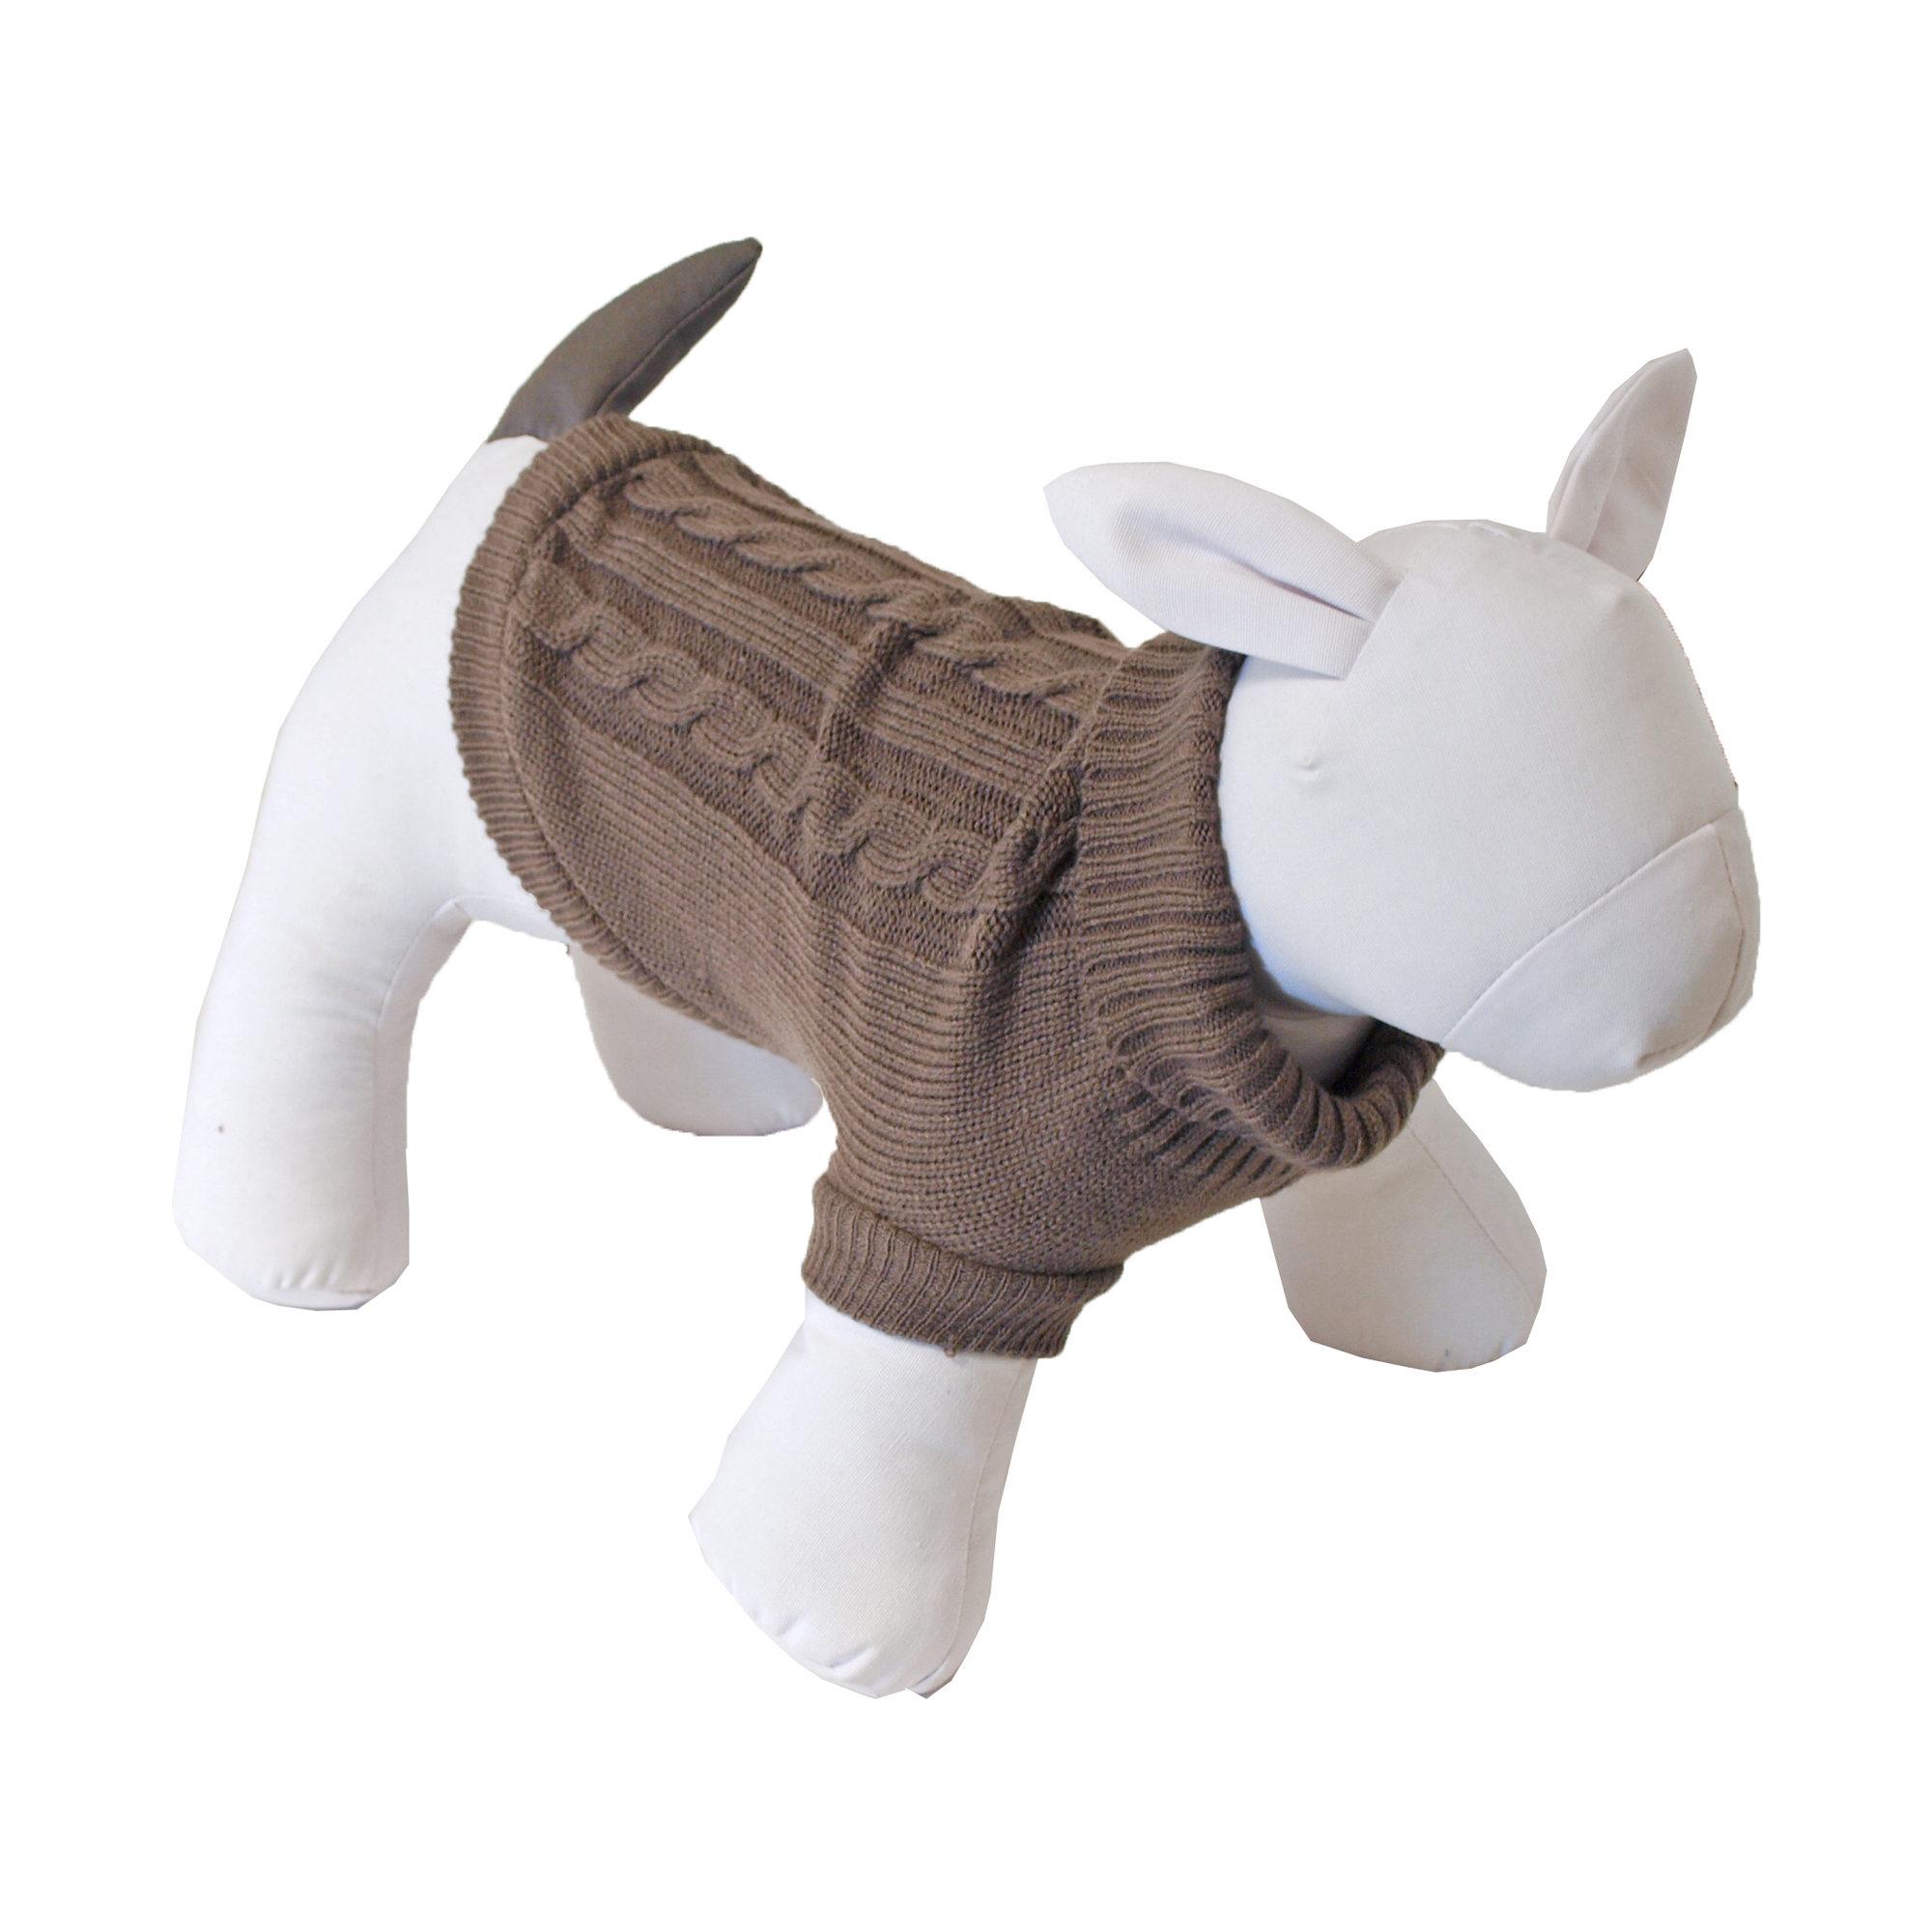 Boony Hundepullover - Braun